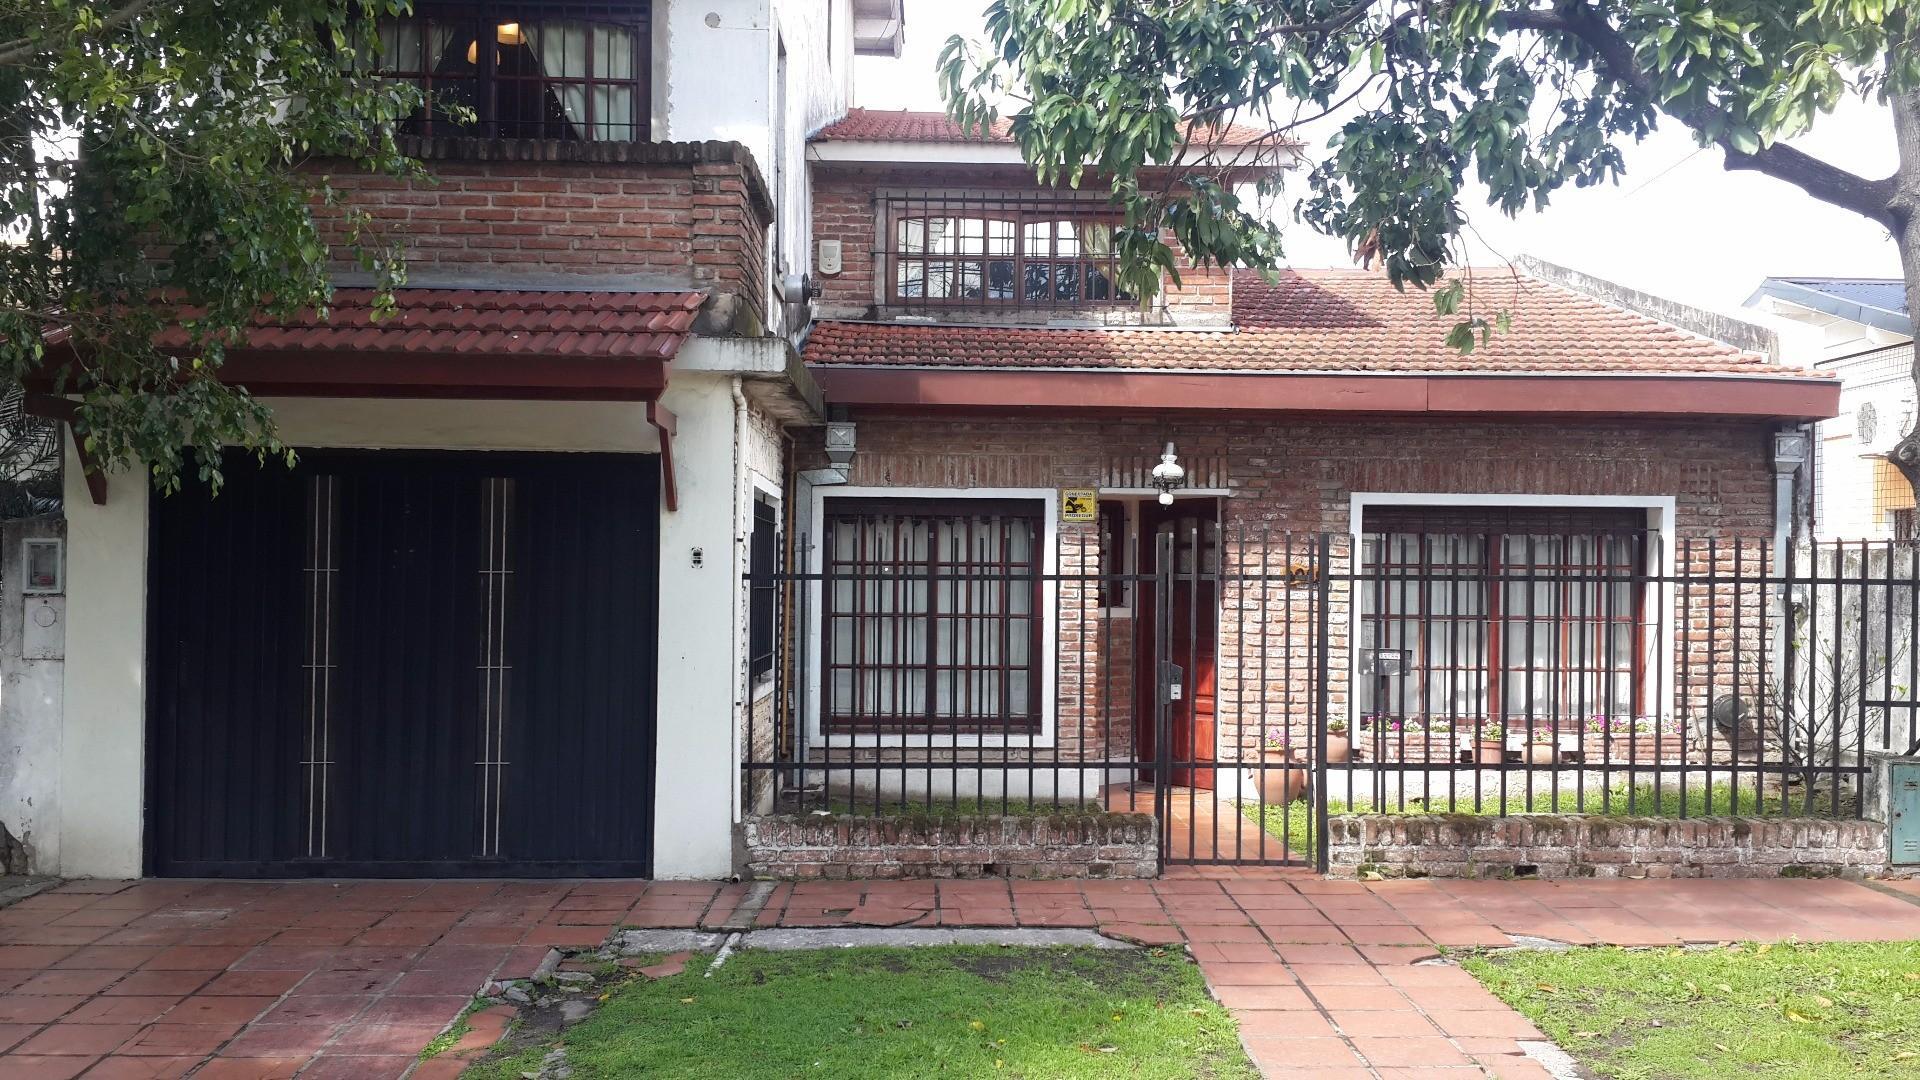 Venta de Chalet en Ituzaingó 6 ambientes, calle La Florida